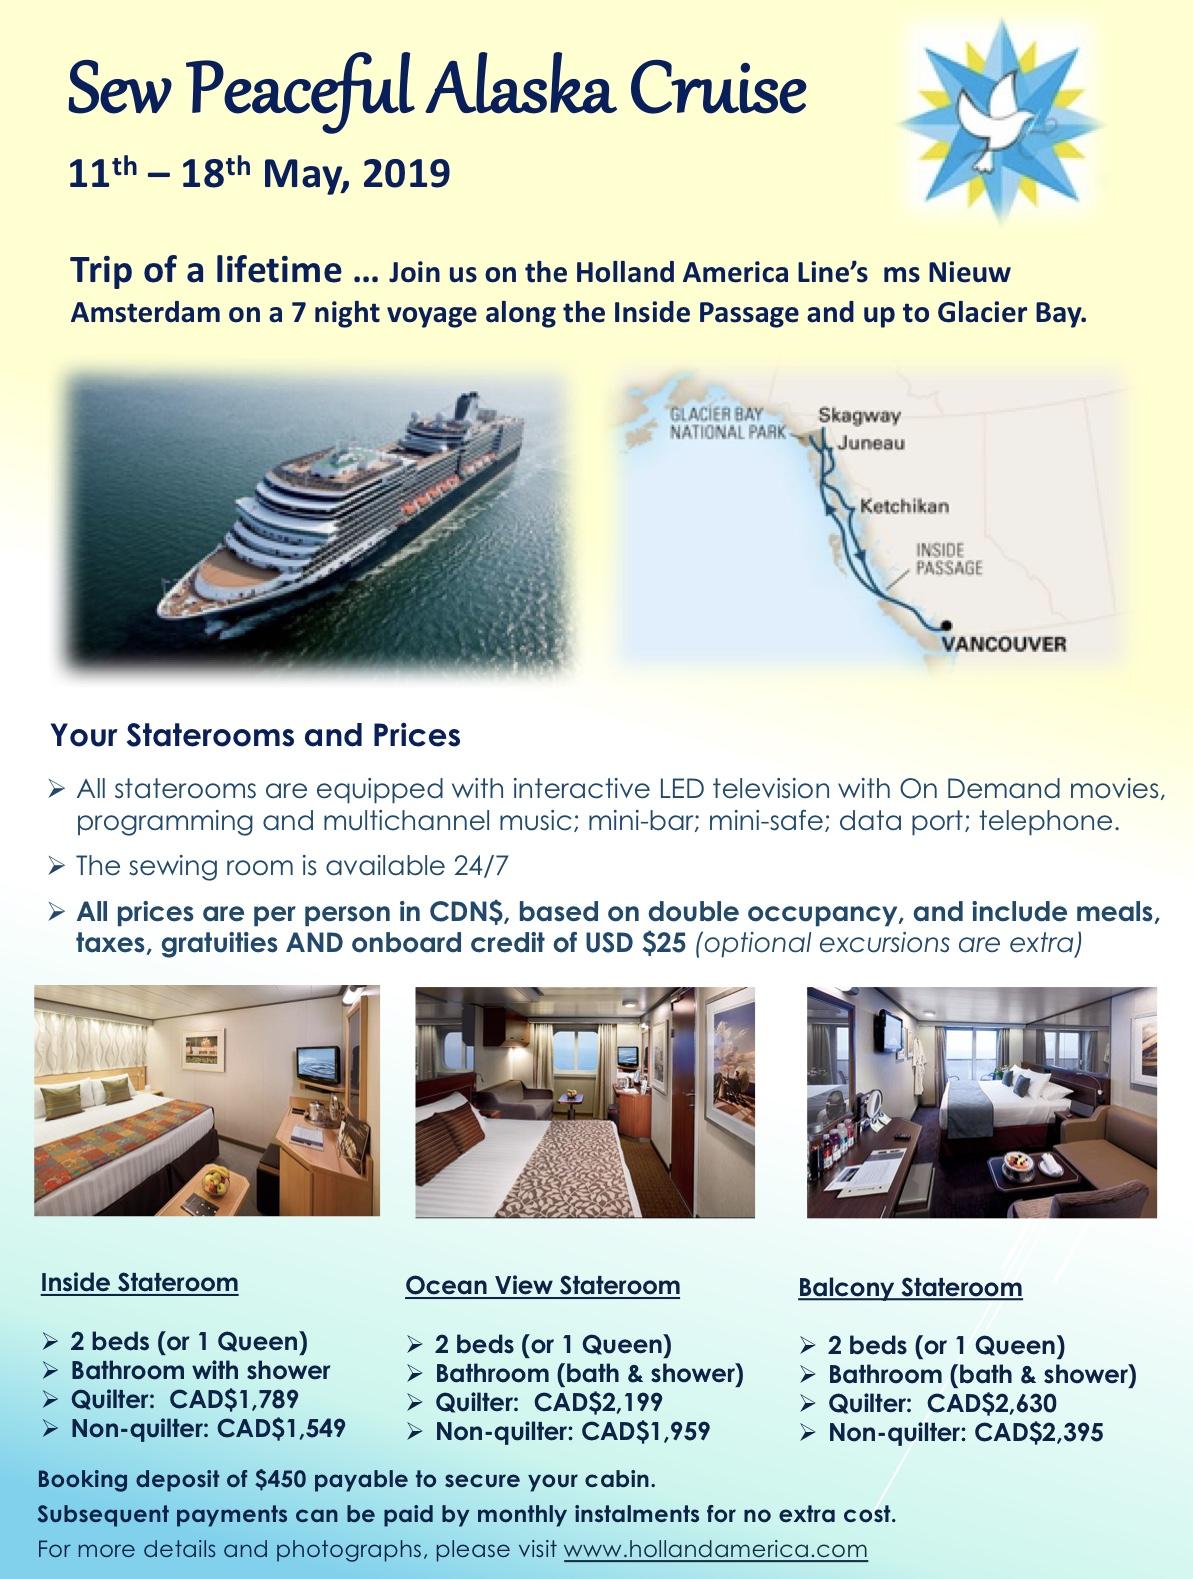 Alaska Cruise flyer May 2019